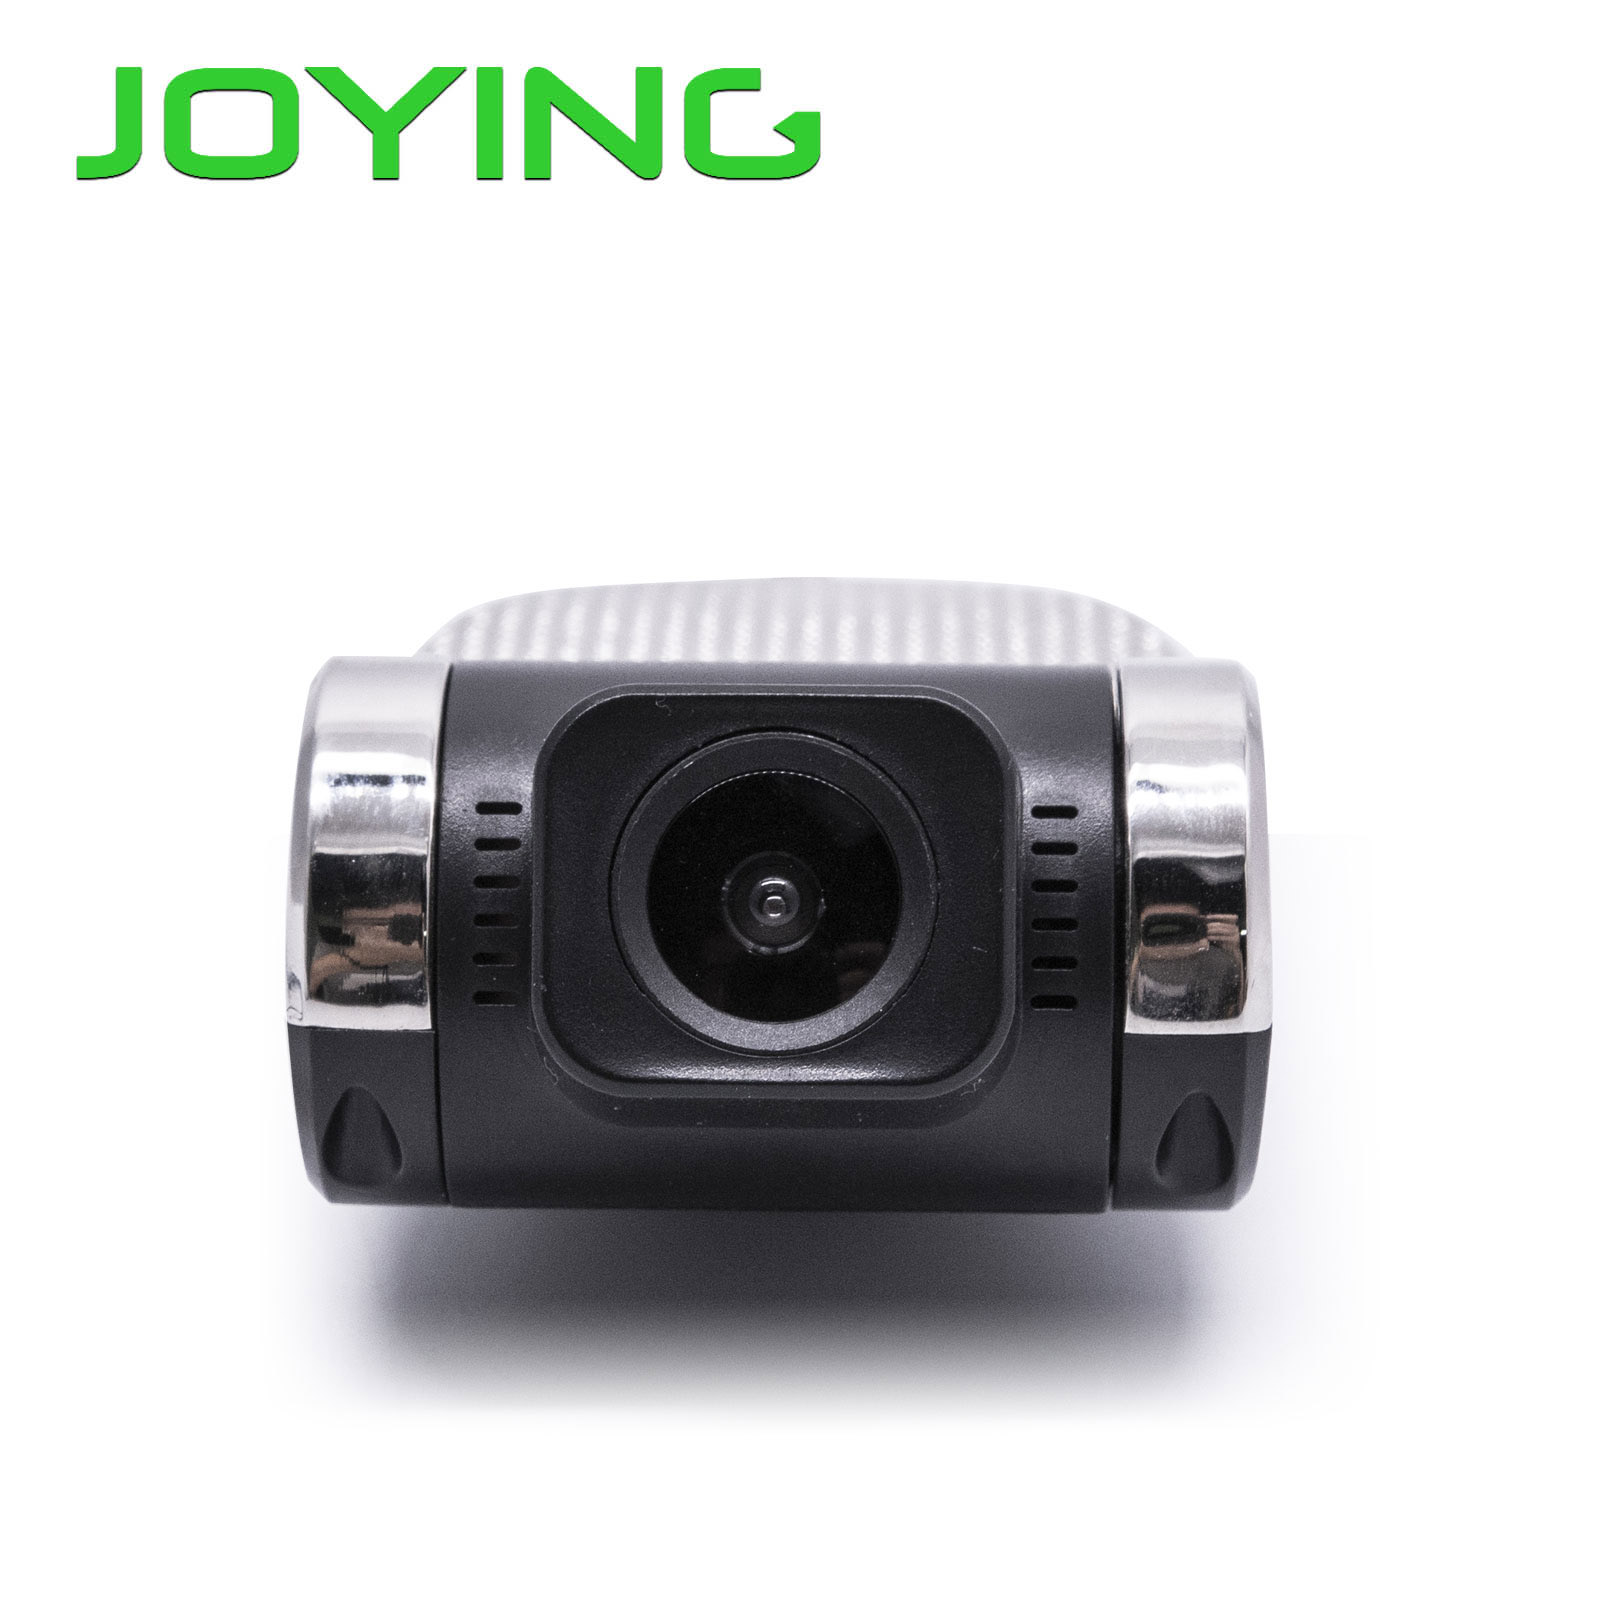 JOYING Car Electronics Accessories Car Radio USB Port Car Front Camera DVR Record Voice